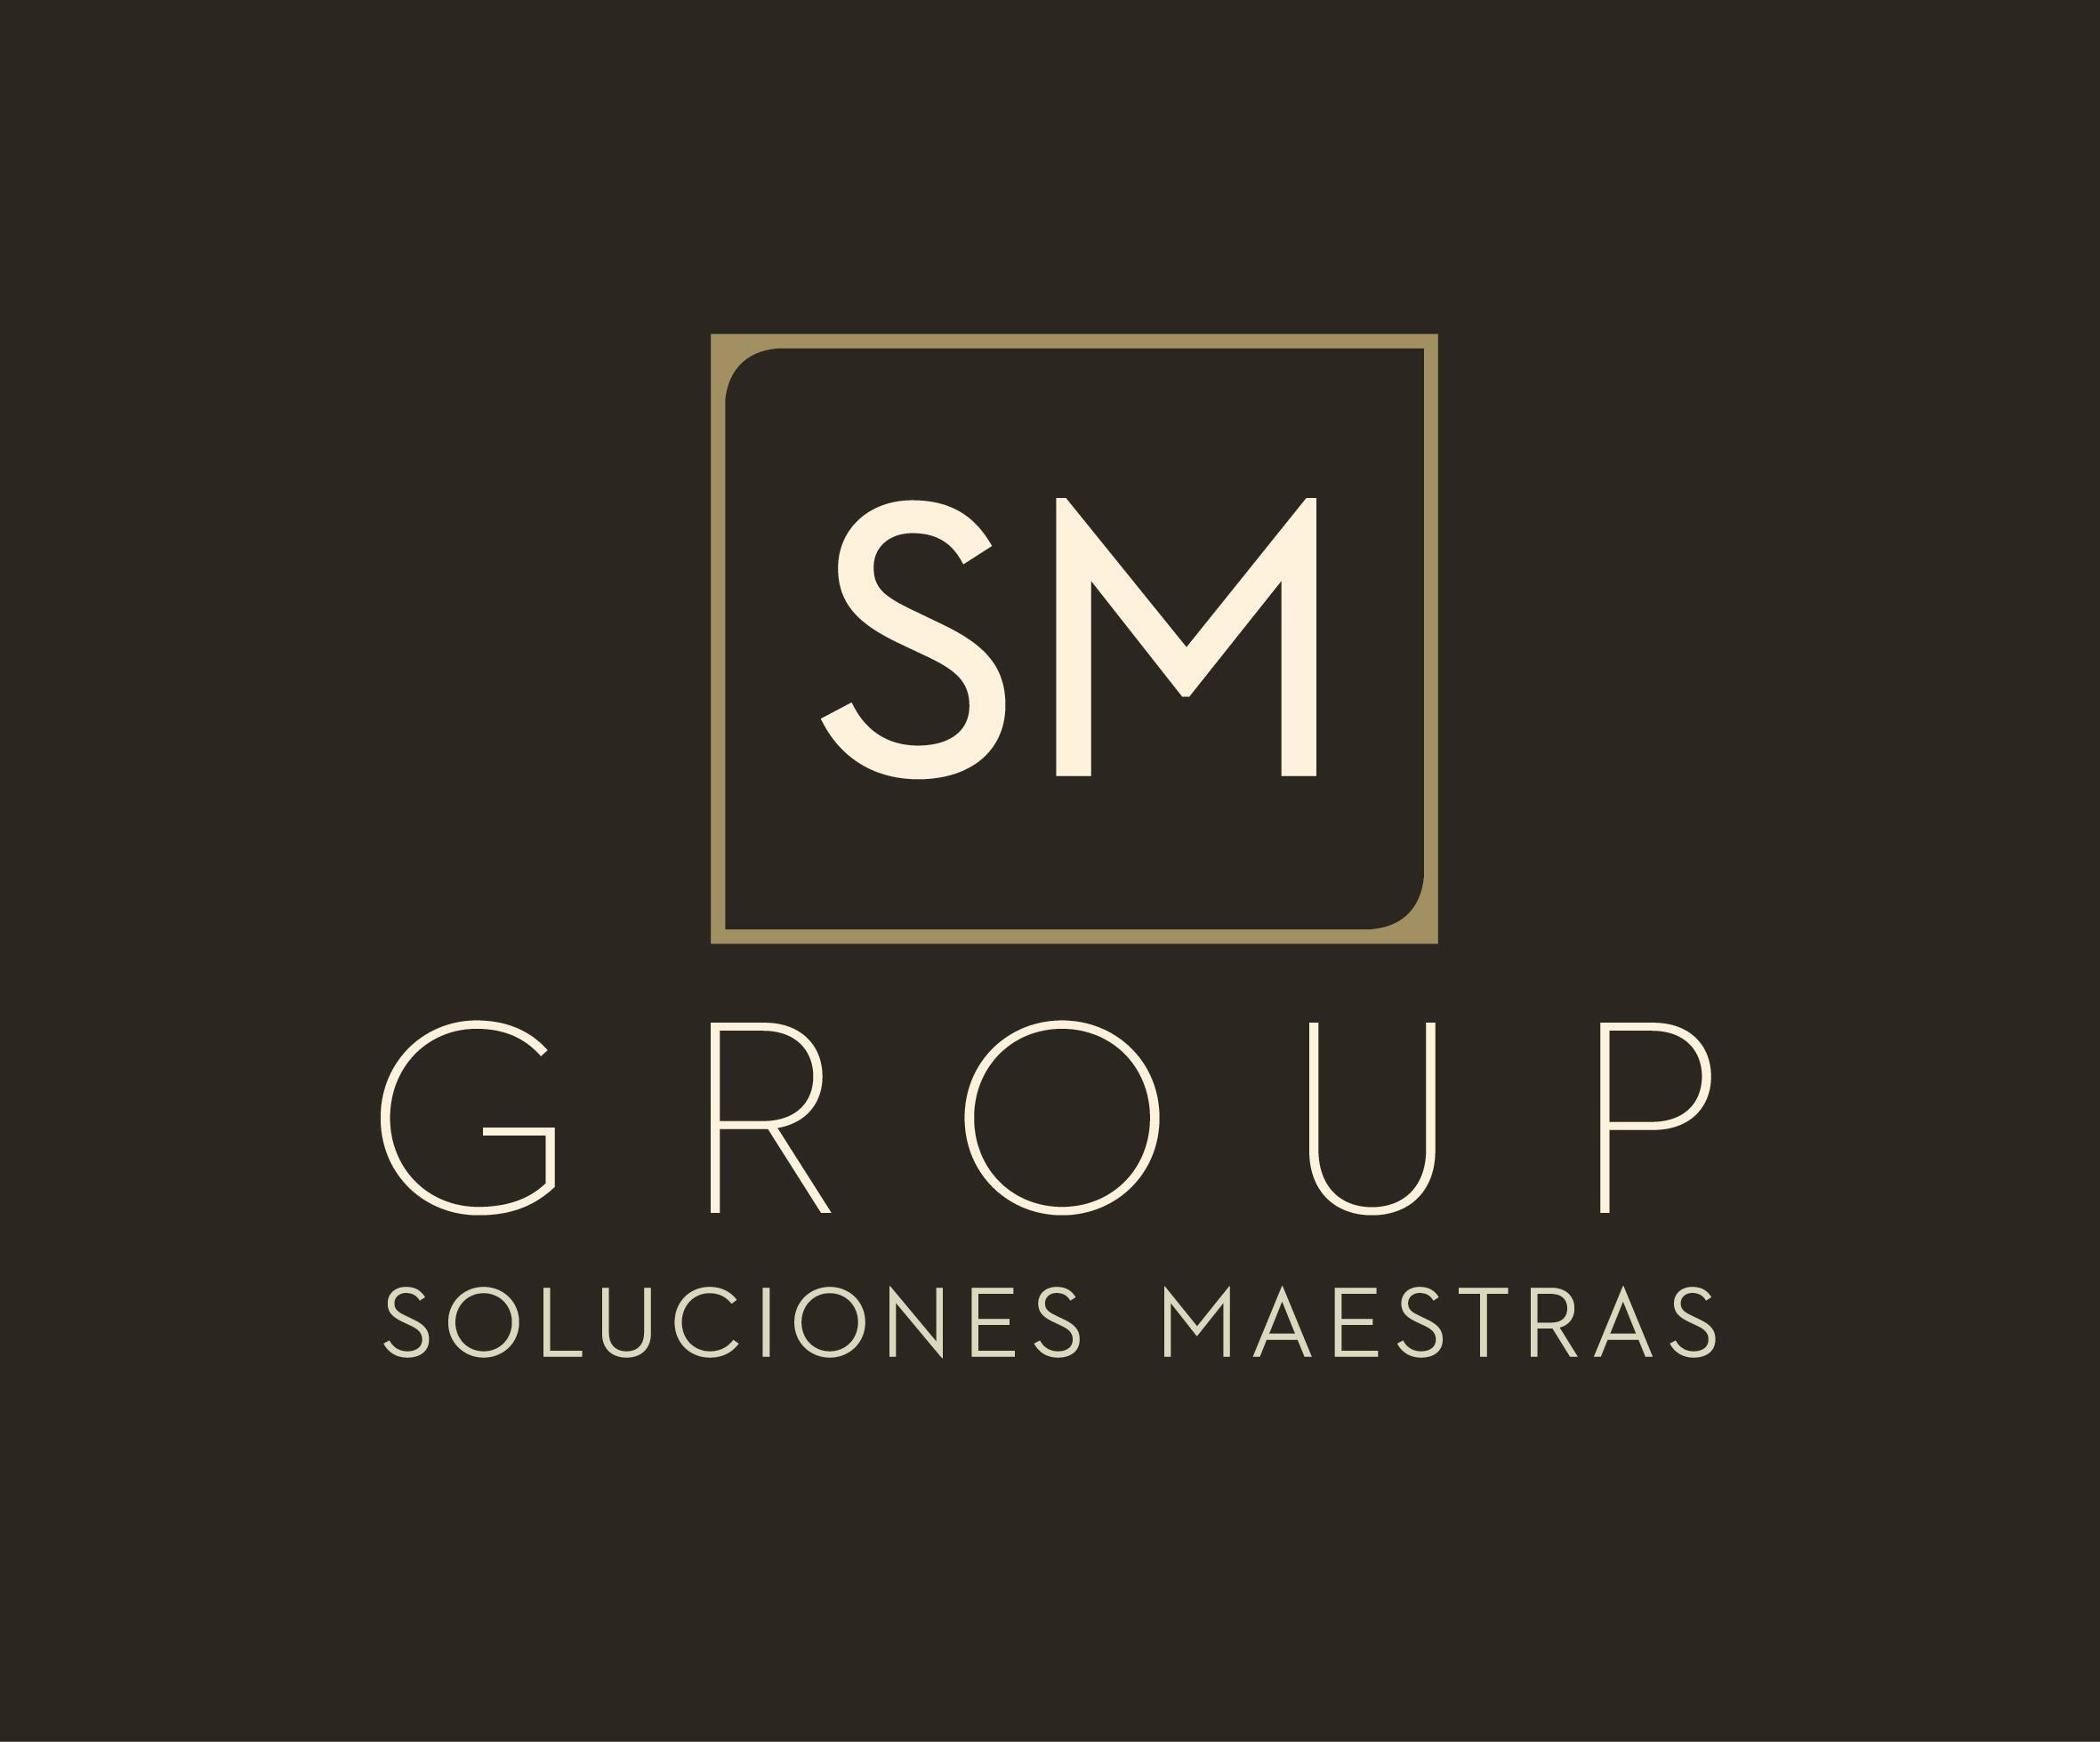 SM Group